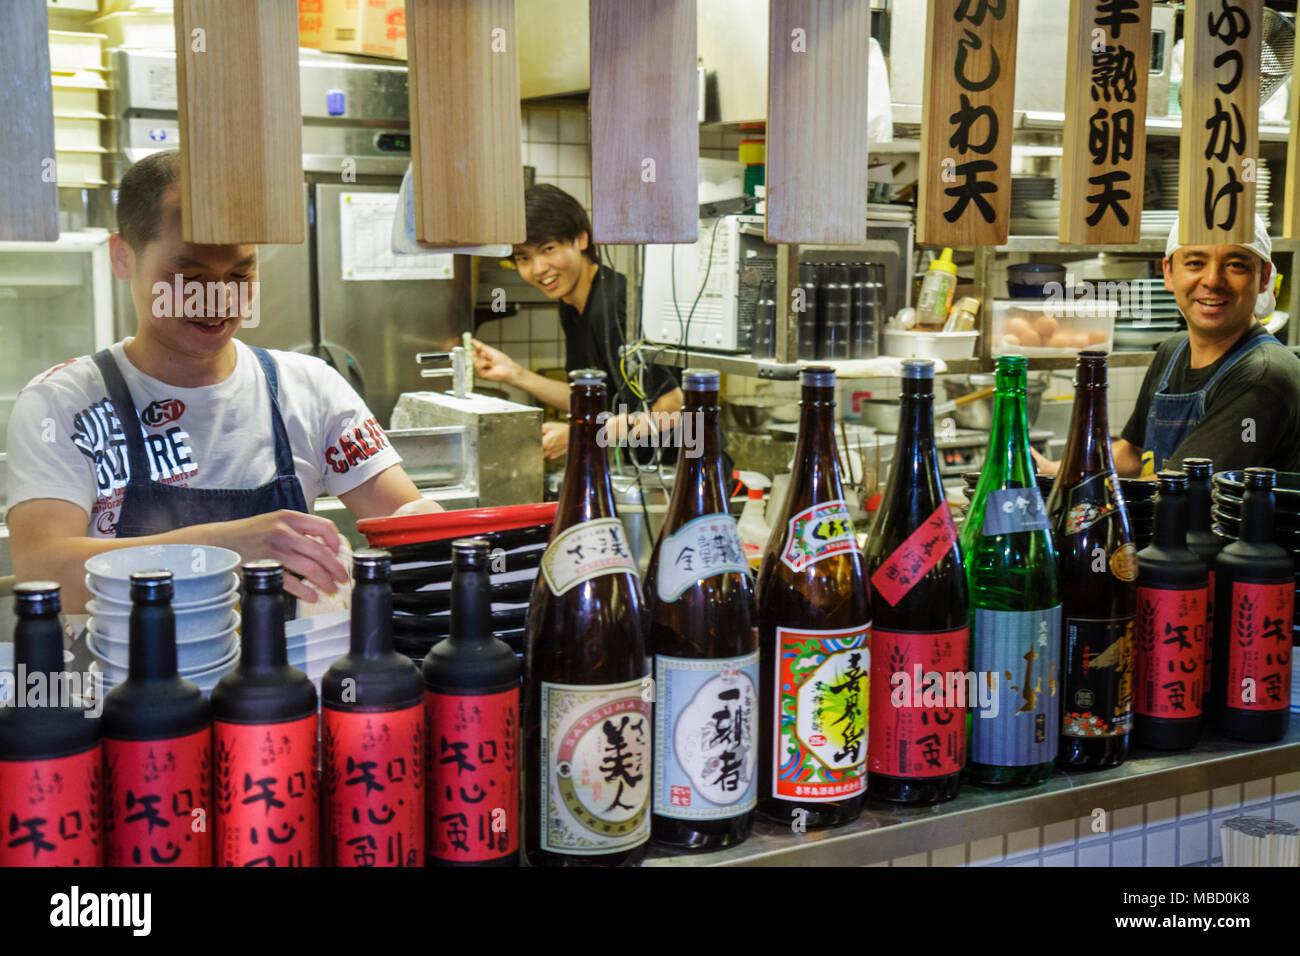 Tokio Japón Akihabara hombre hombres trabajadores asiáticos restaurante cocina cook símbolos de caracteres katakana hiragana KANJI Japonés Español Imagen De Stock